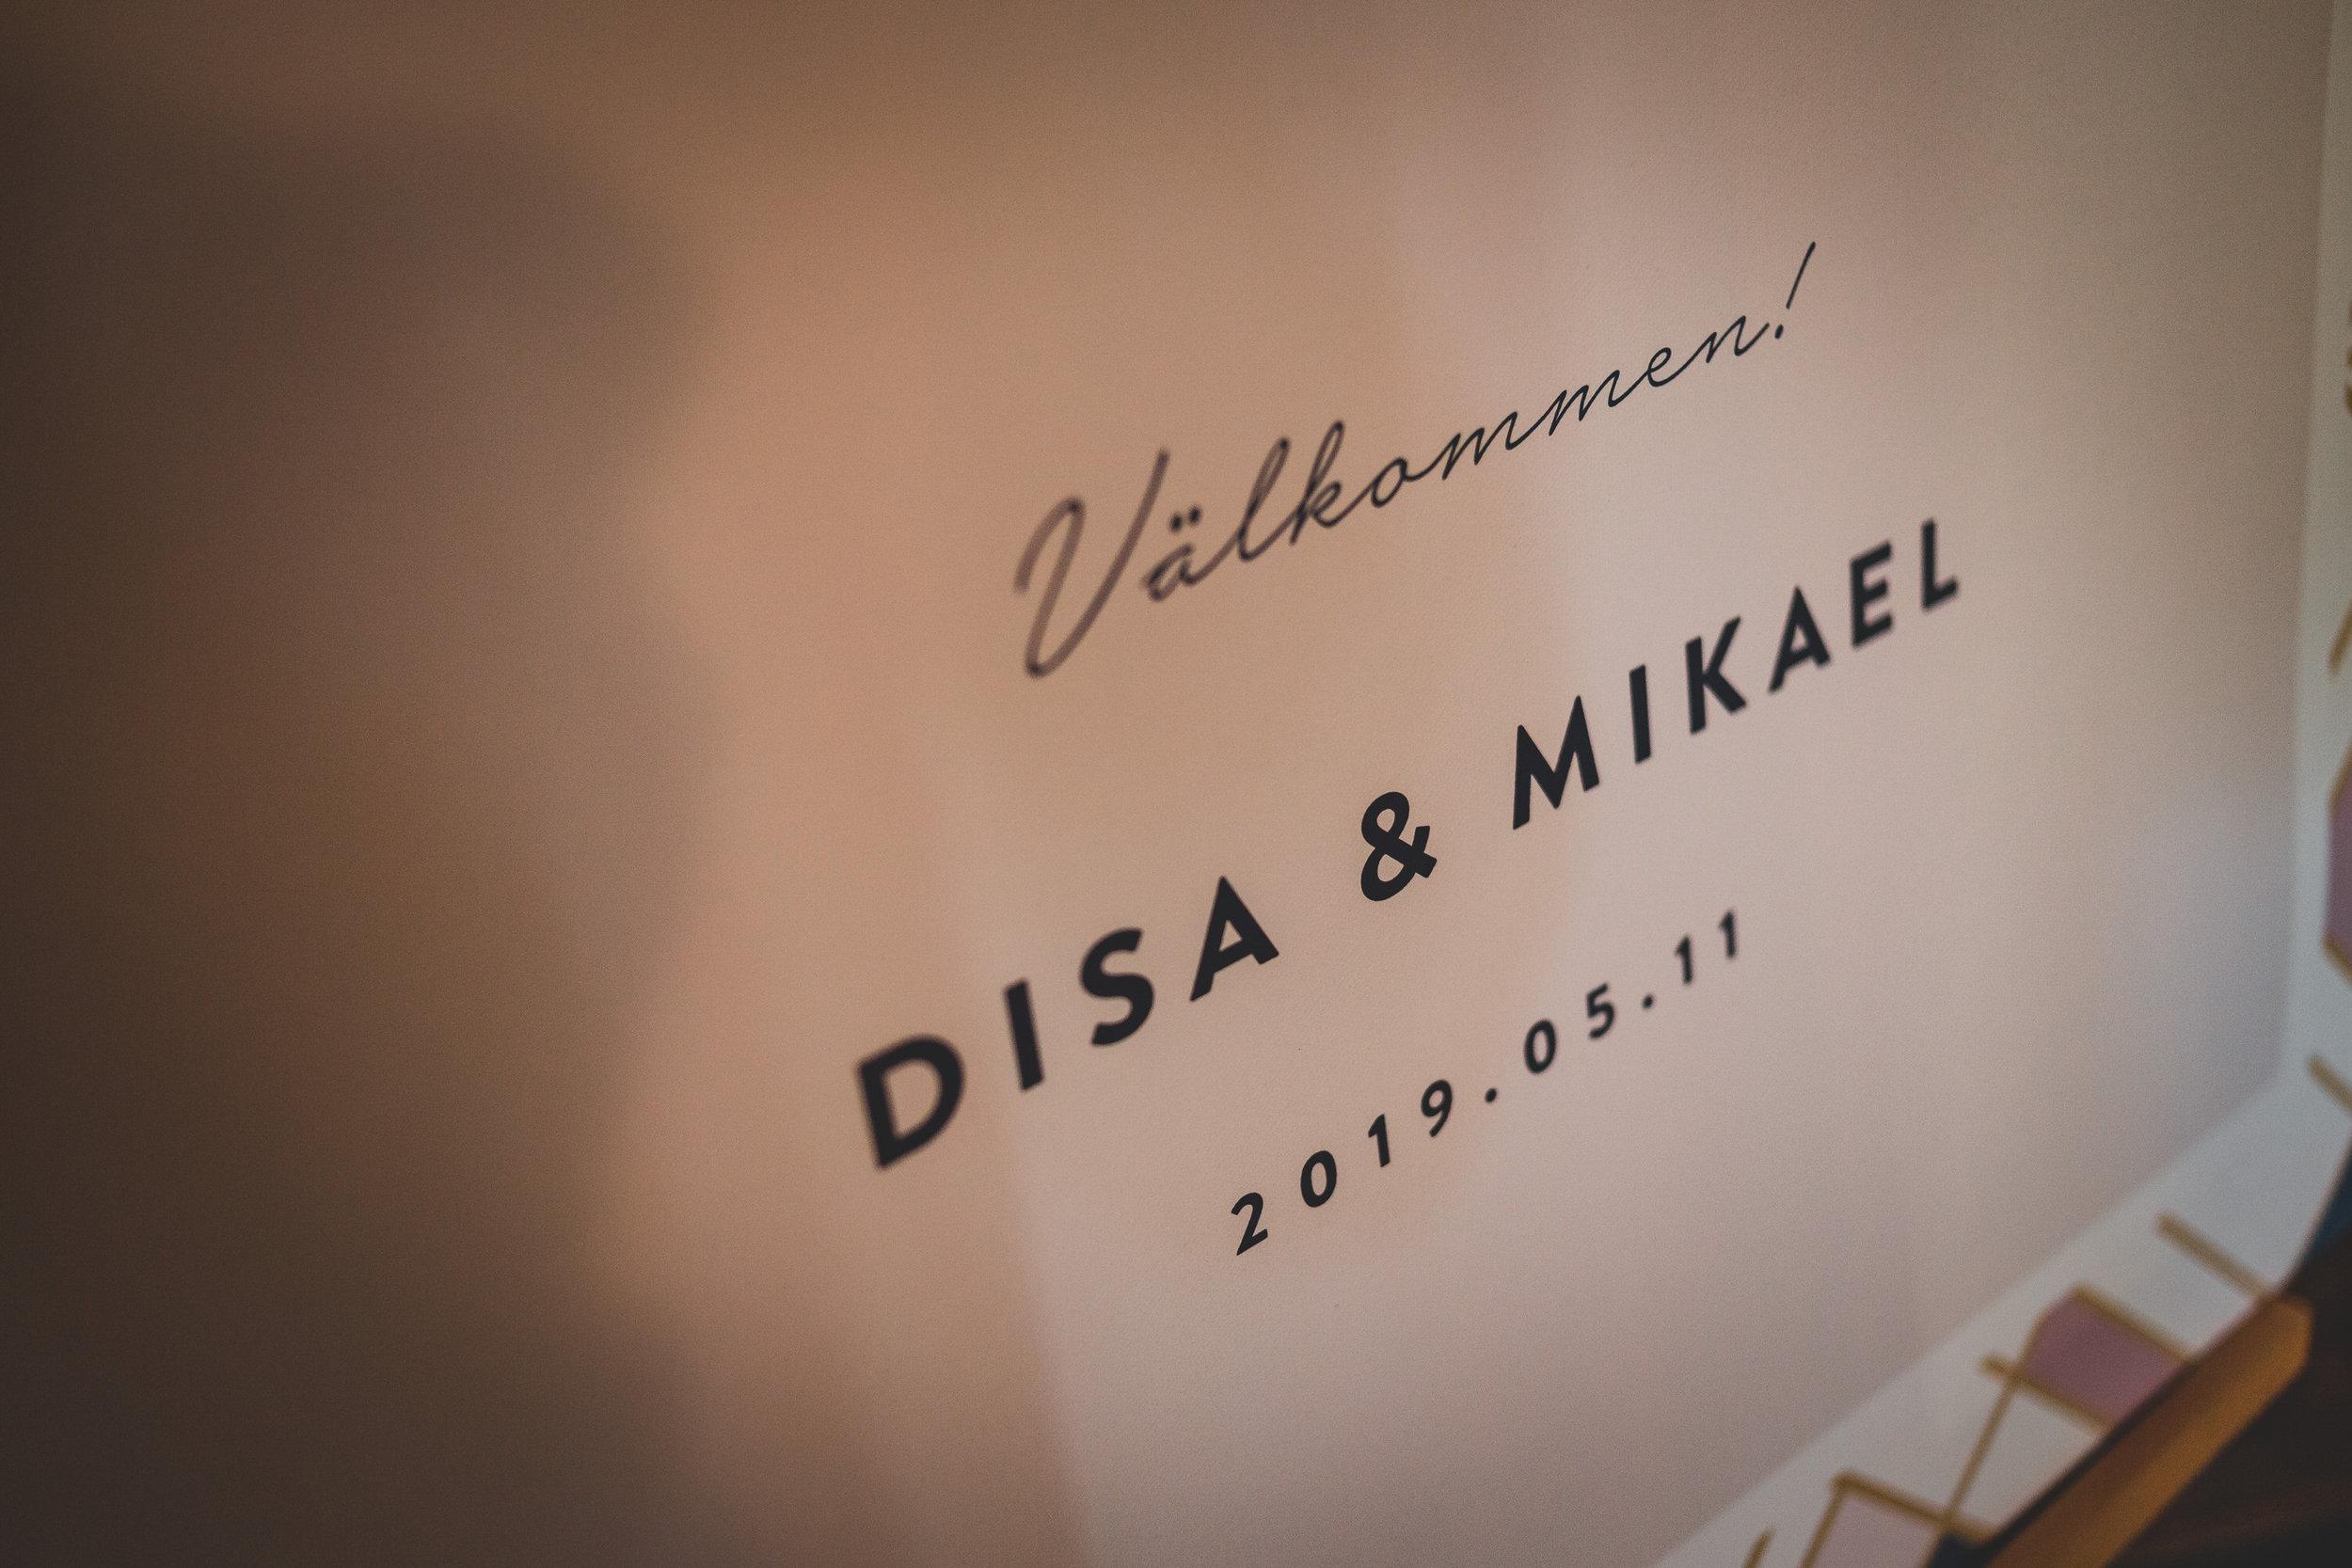 Disa & Mikael-200_1.jpg